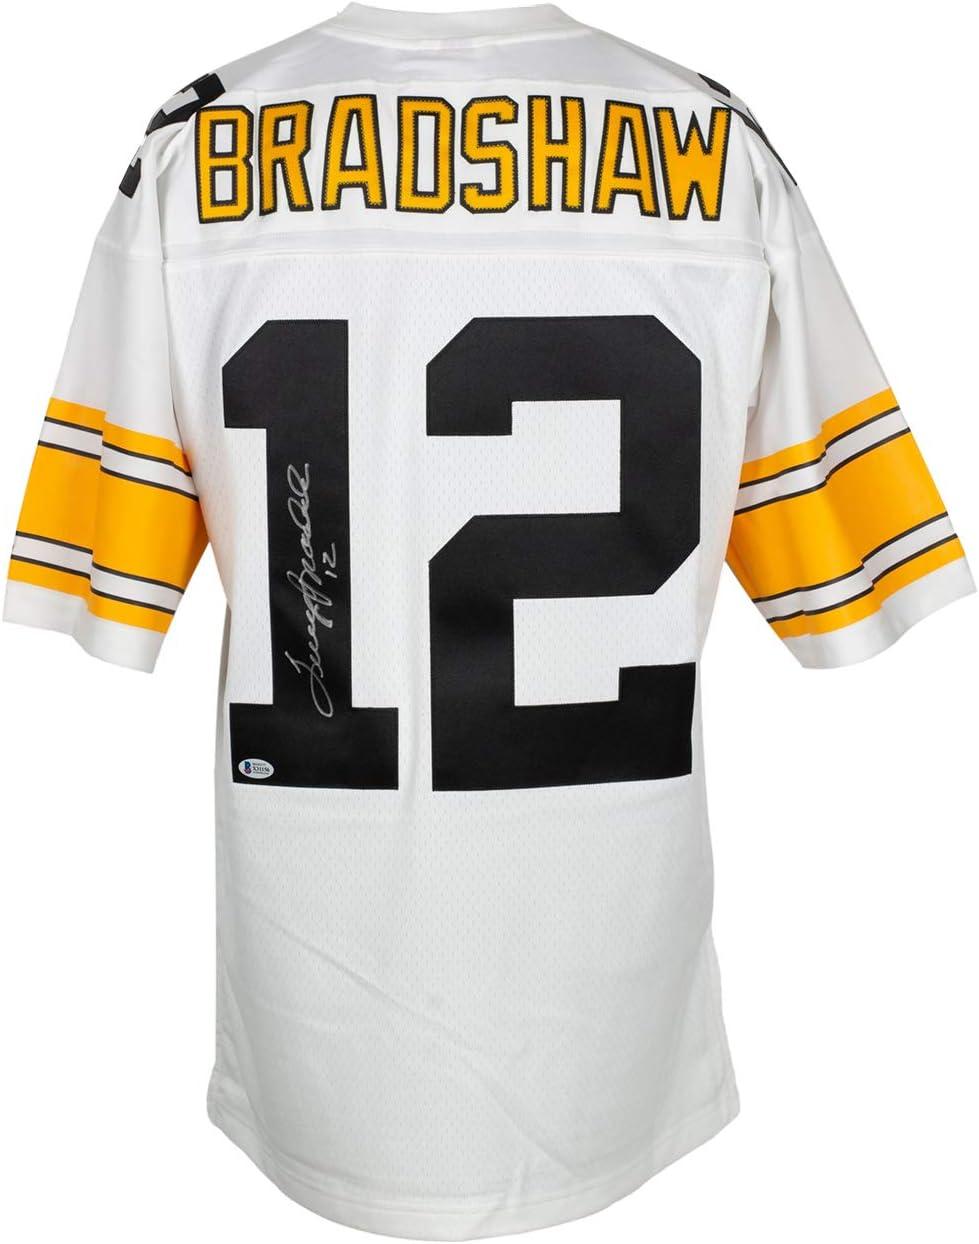 Terry Bradshaw Signed Pittsburgh Mitchell & Ness Football Jersey BAS